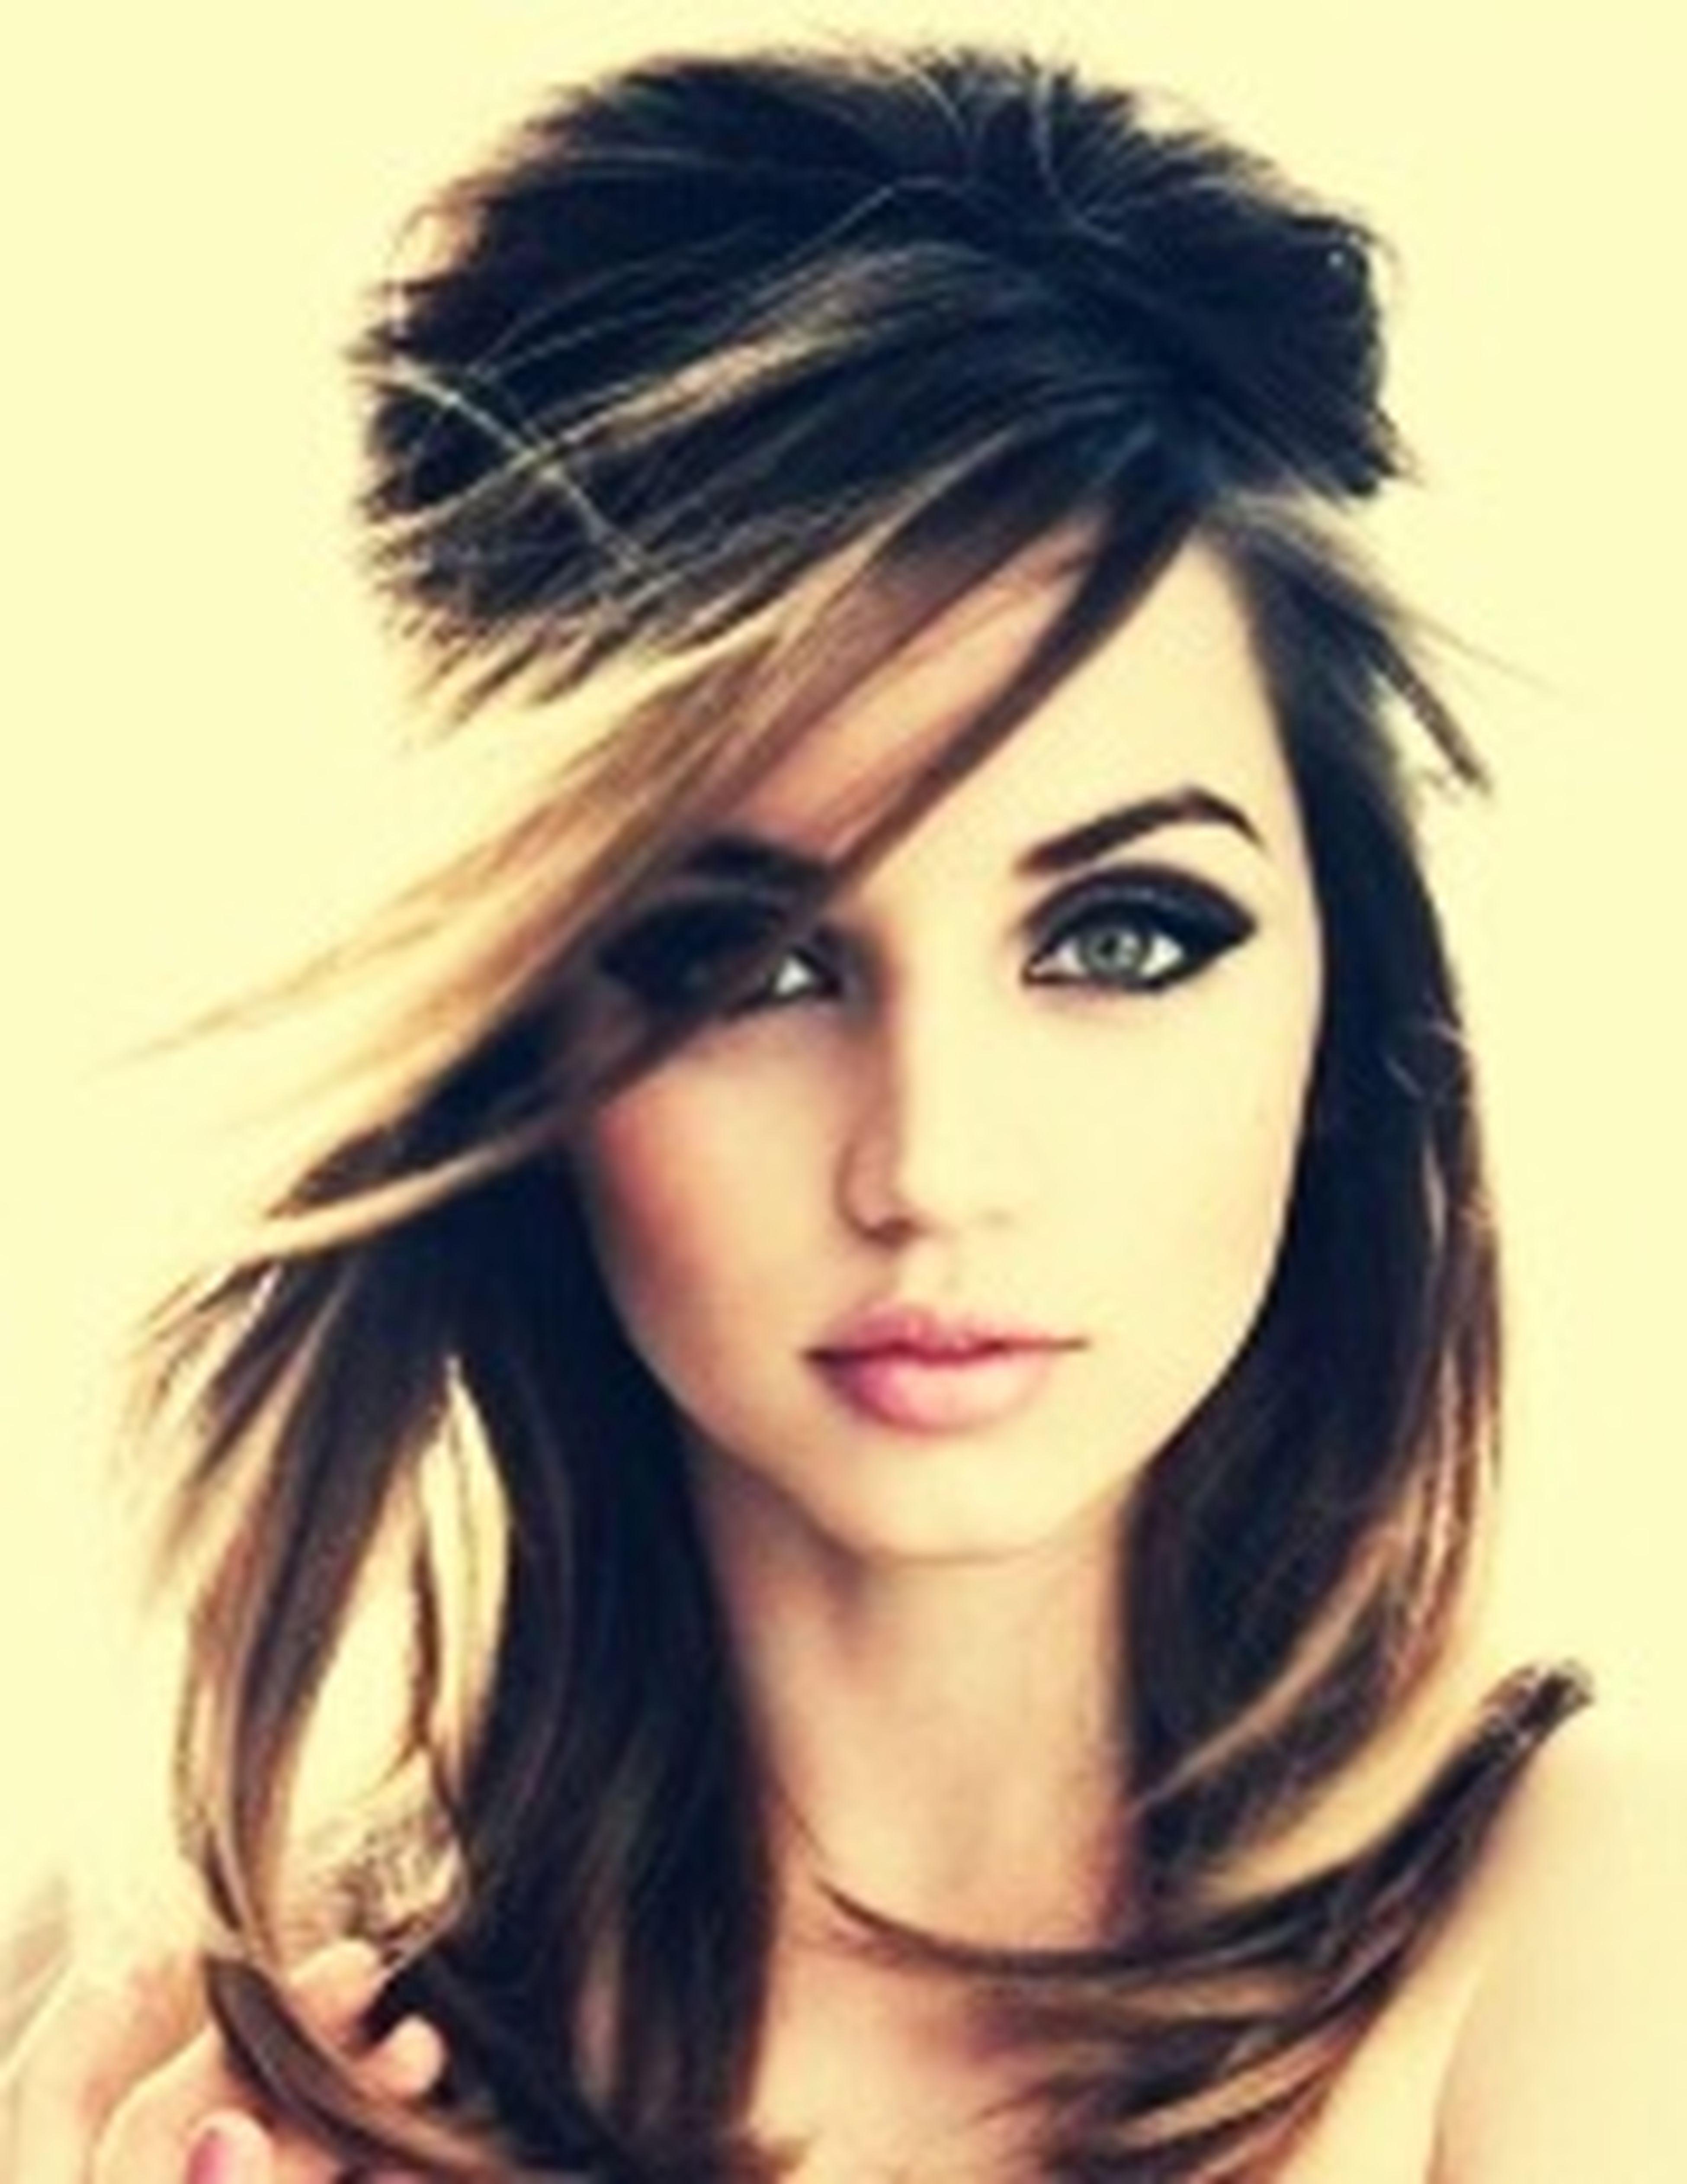 Girl Girly Pretty Iran Beautiful Girl Beautiful ♥ Beauty Nice Fatemeh Fairy Fairy World